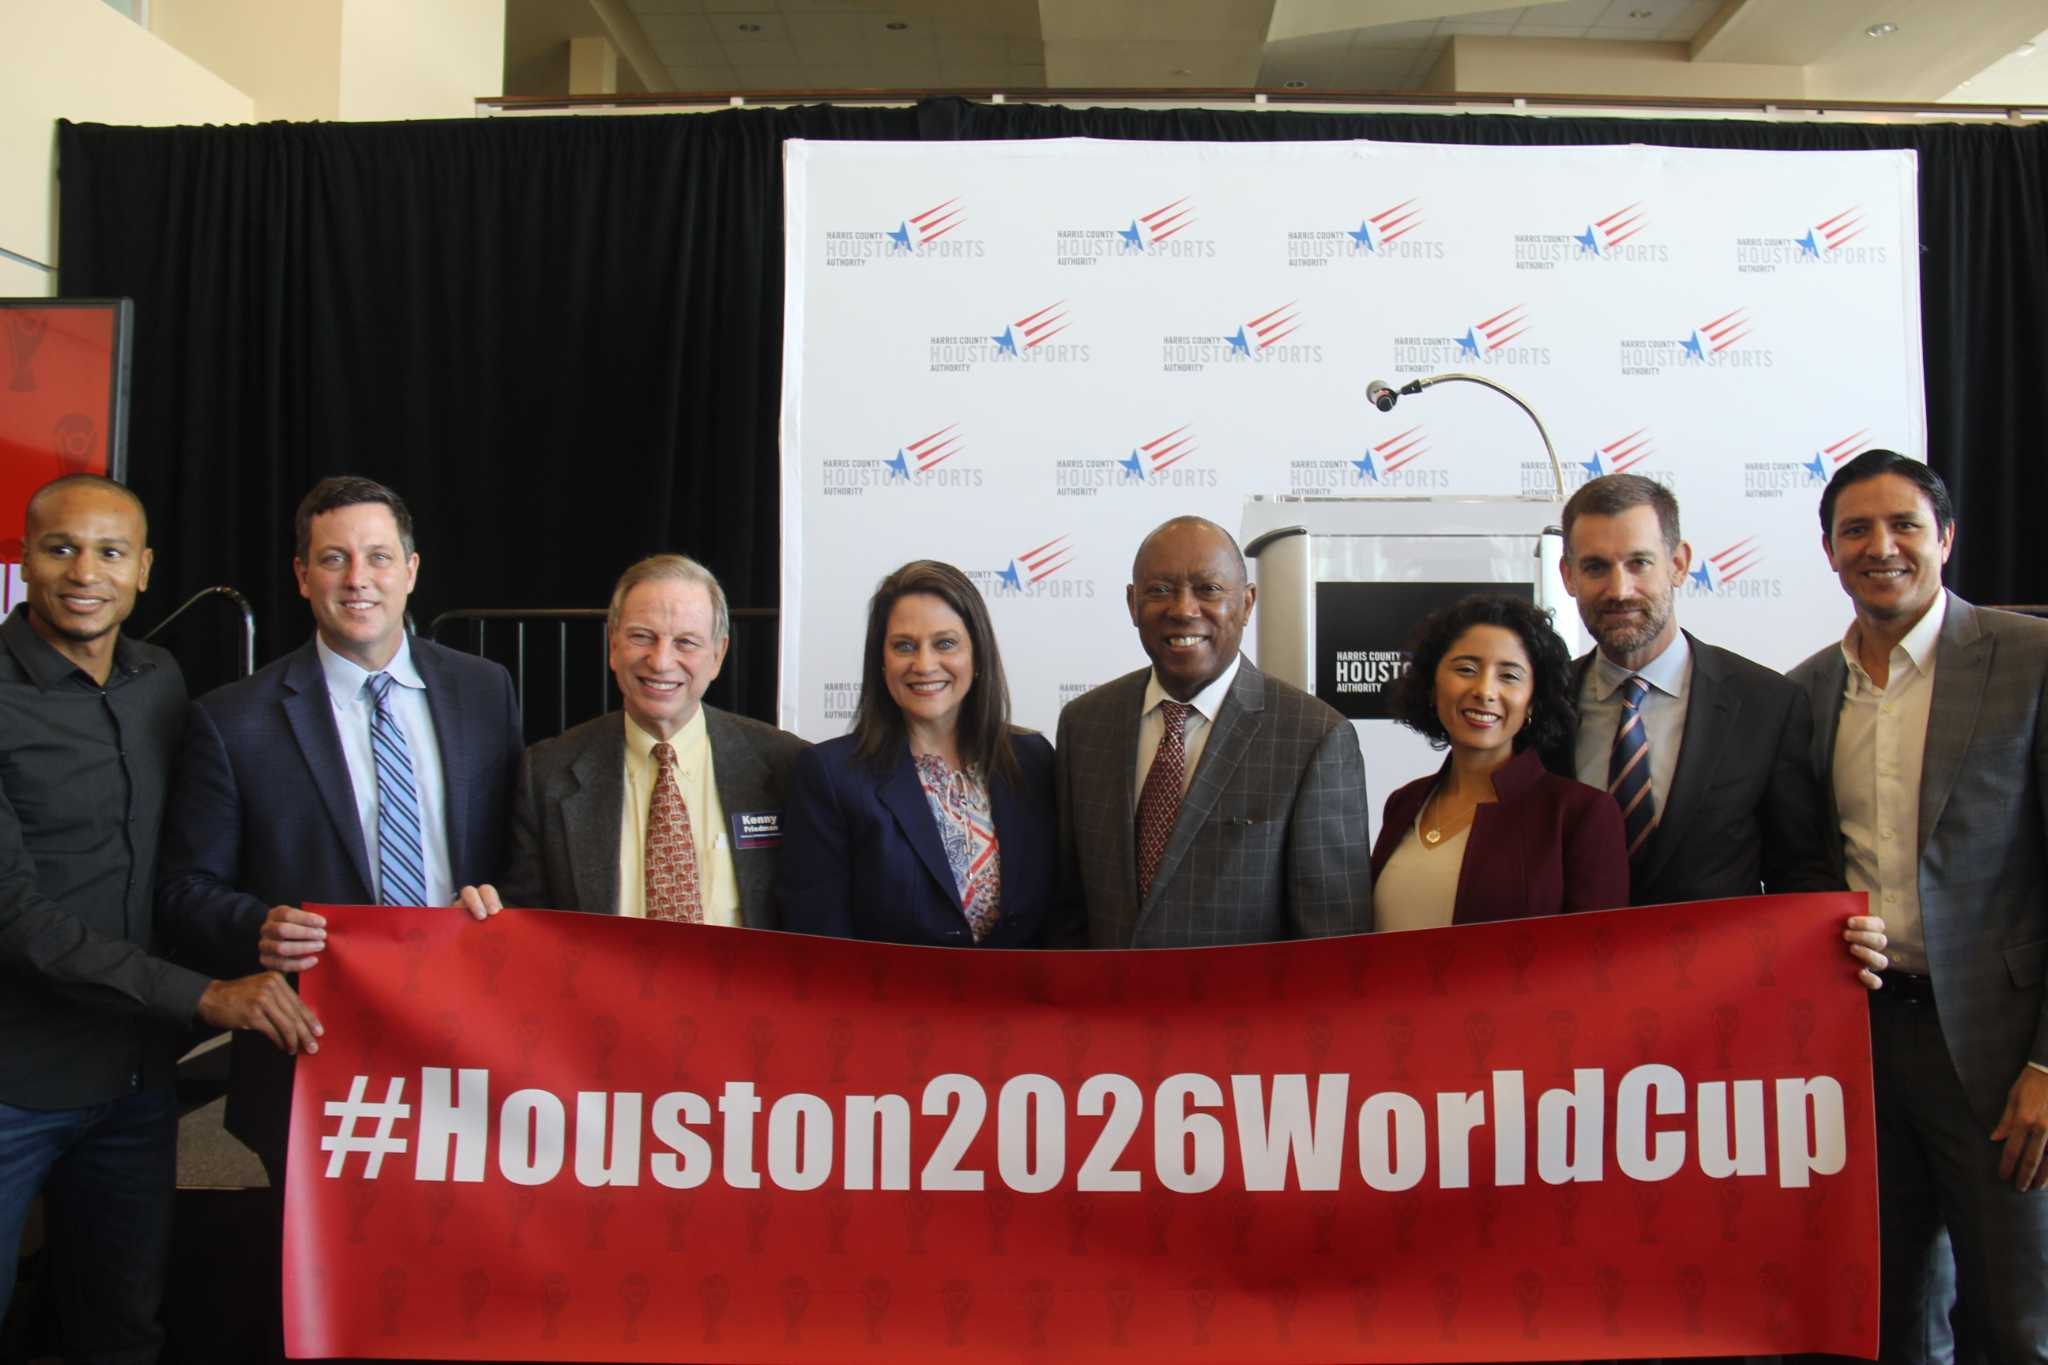 Houston's World Cup bid hopeful of hosting six matches